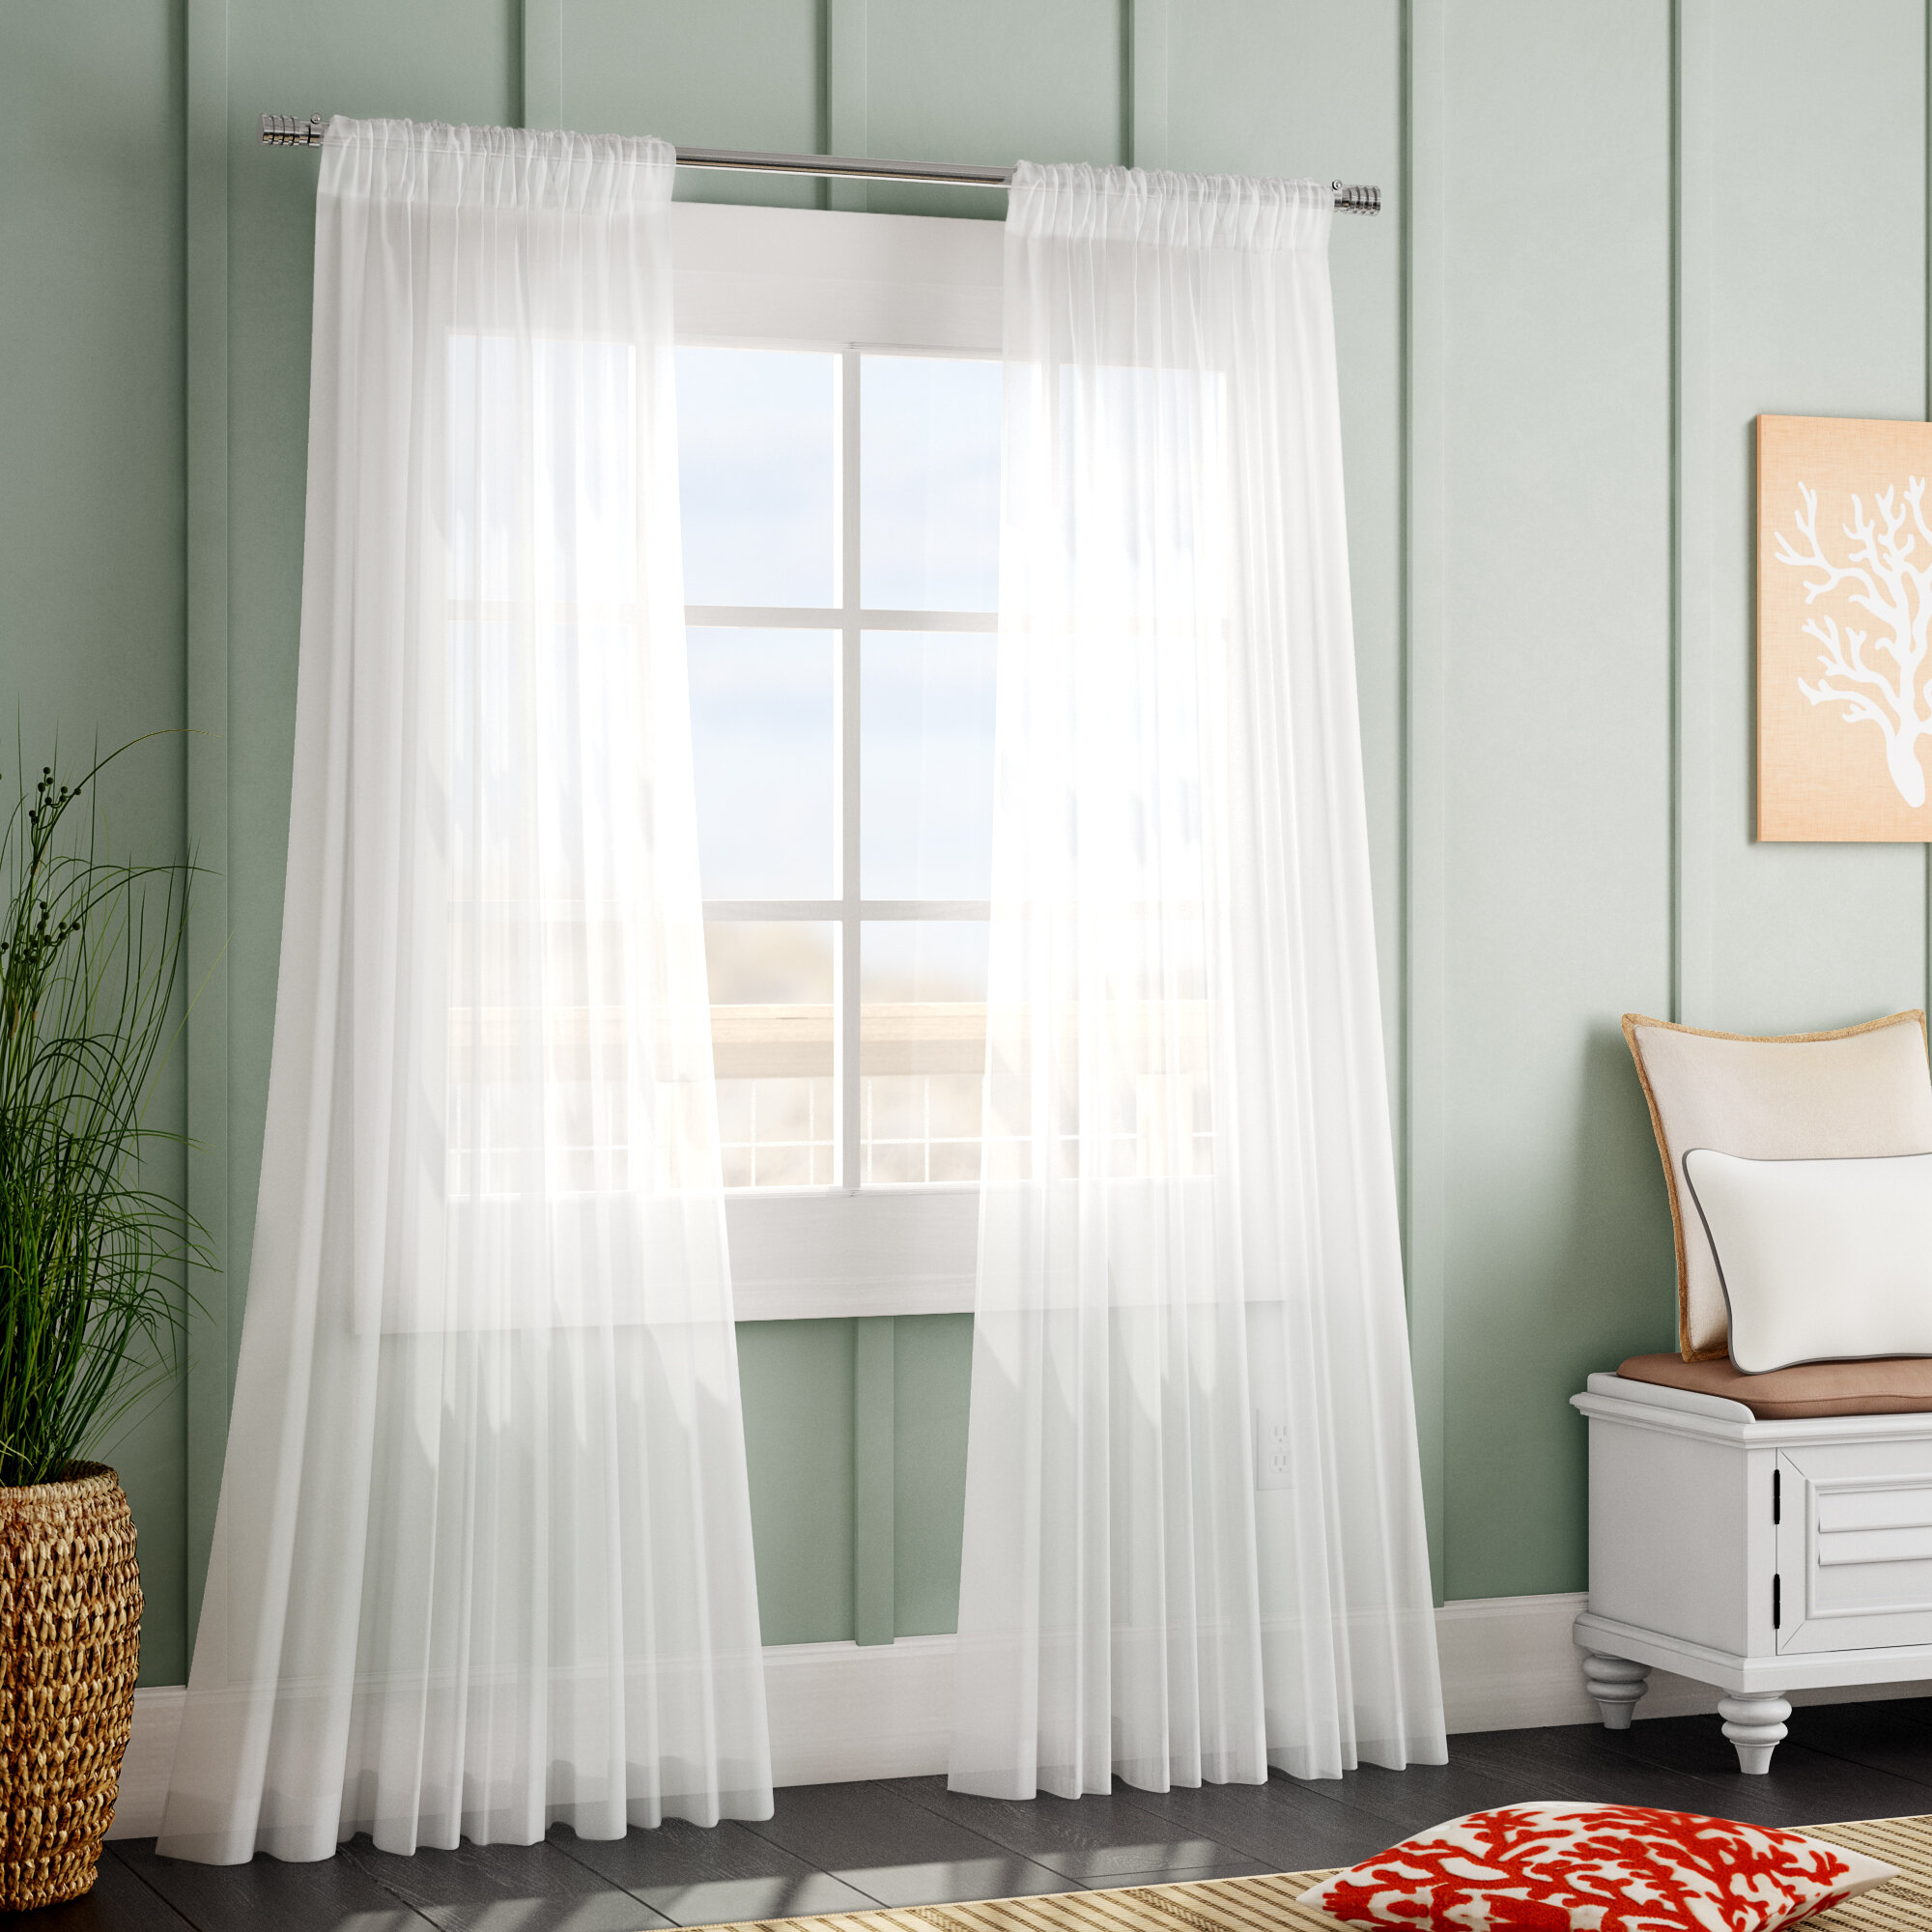 Beachcrest Home Tiya Double Layered Synthetic Solid Sheer Rod Pocket Single Curtain Panel Reviews Wayfair